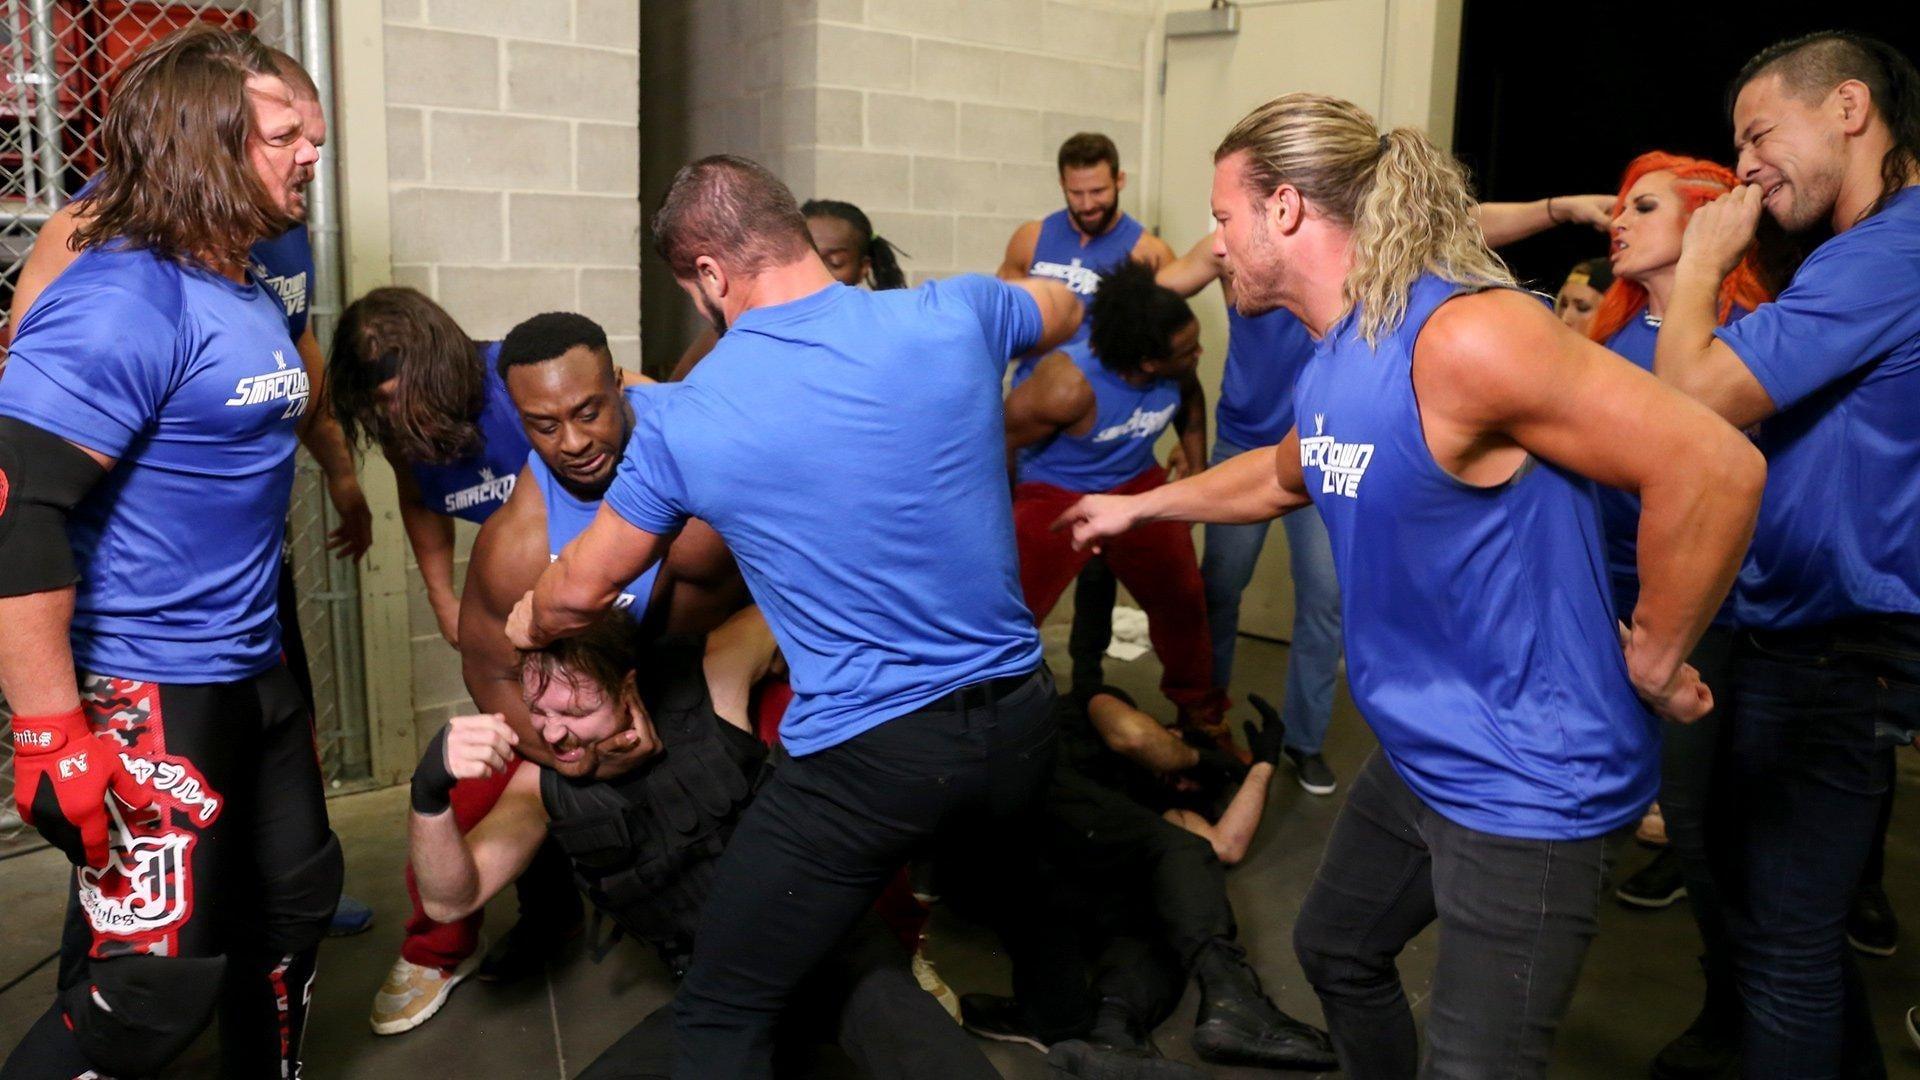 WWE Raw - Season 25 Episode 43 : October 23, 2017 (Green Bay, WI)